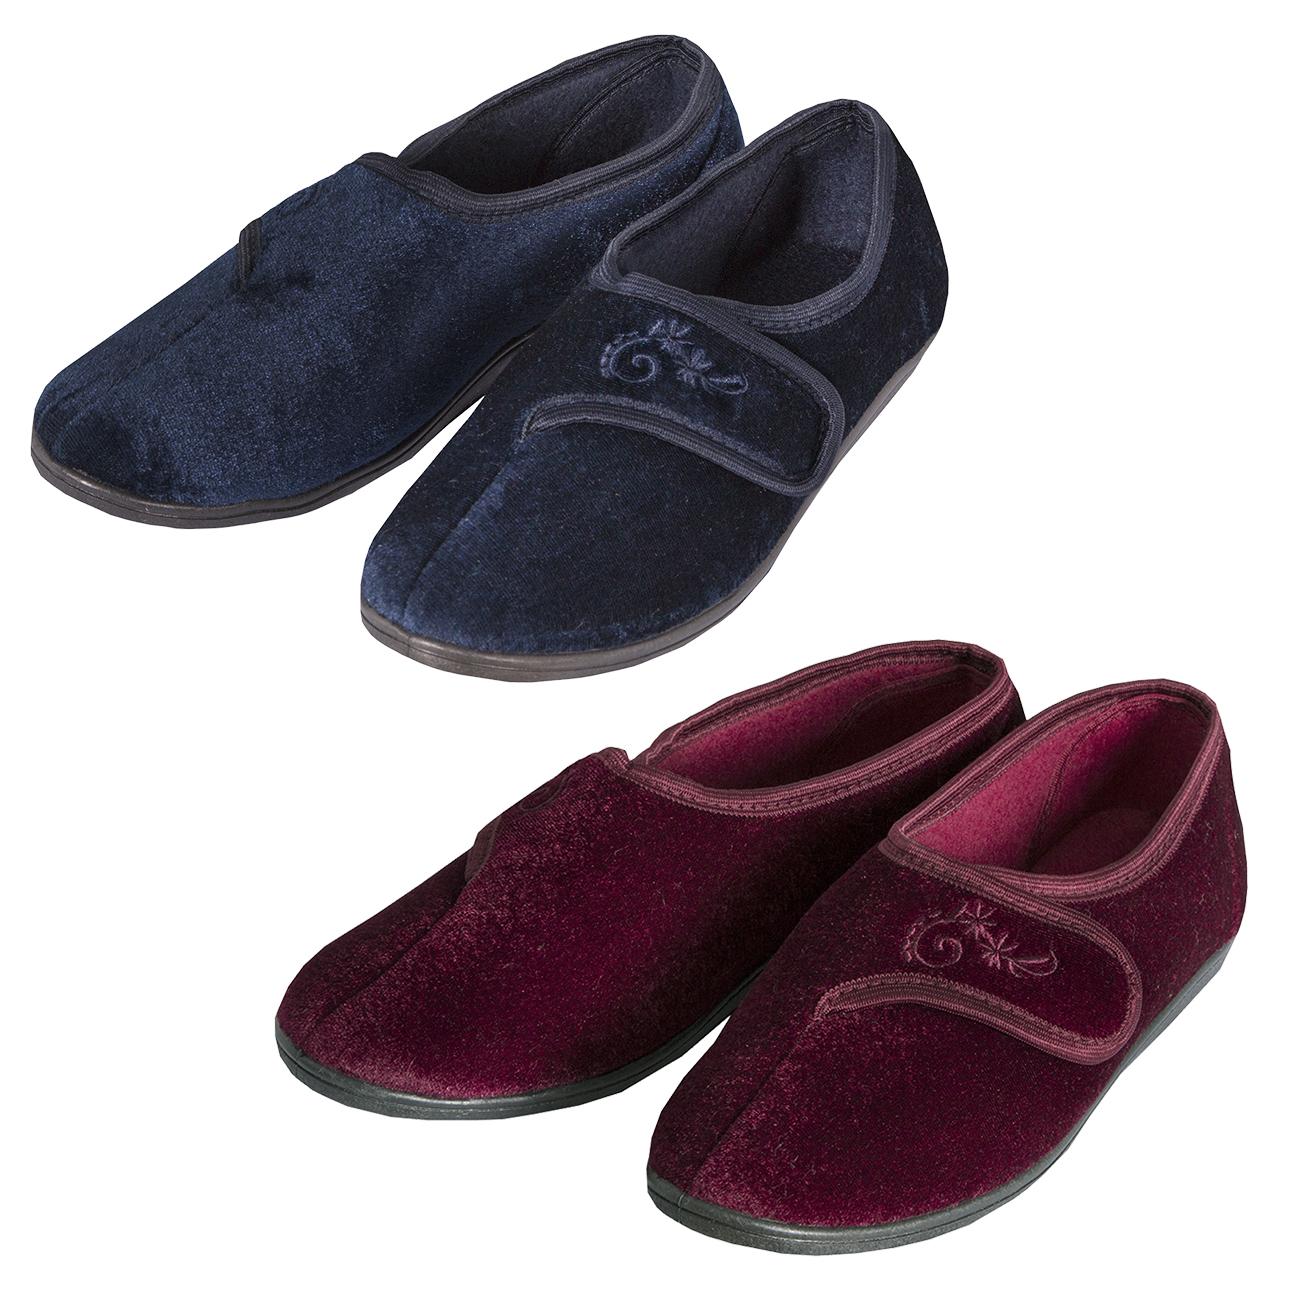 Ladies Womens Velour House Slippers